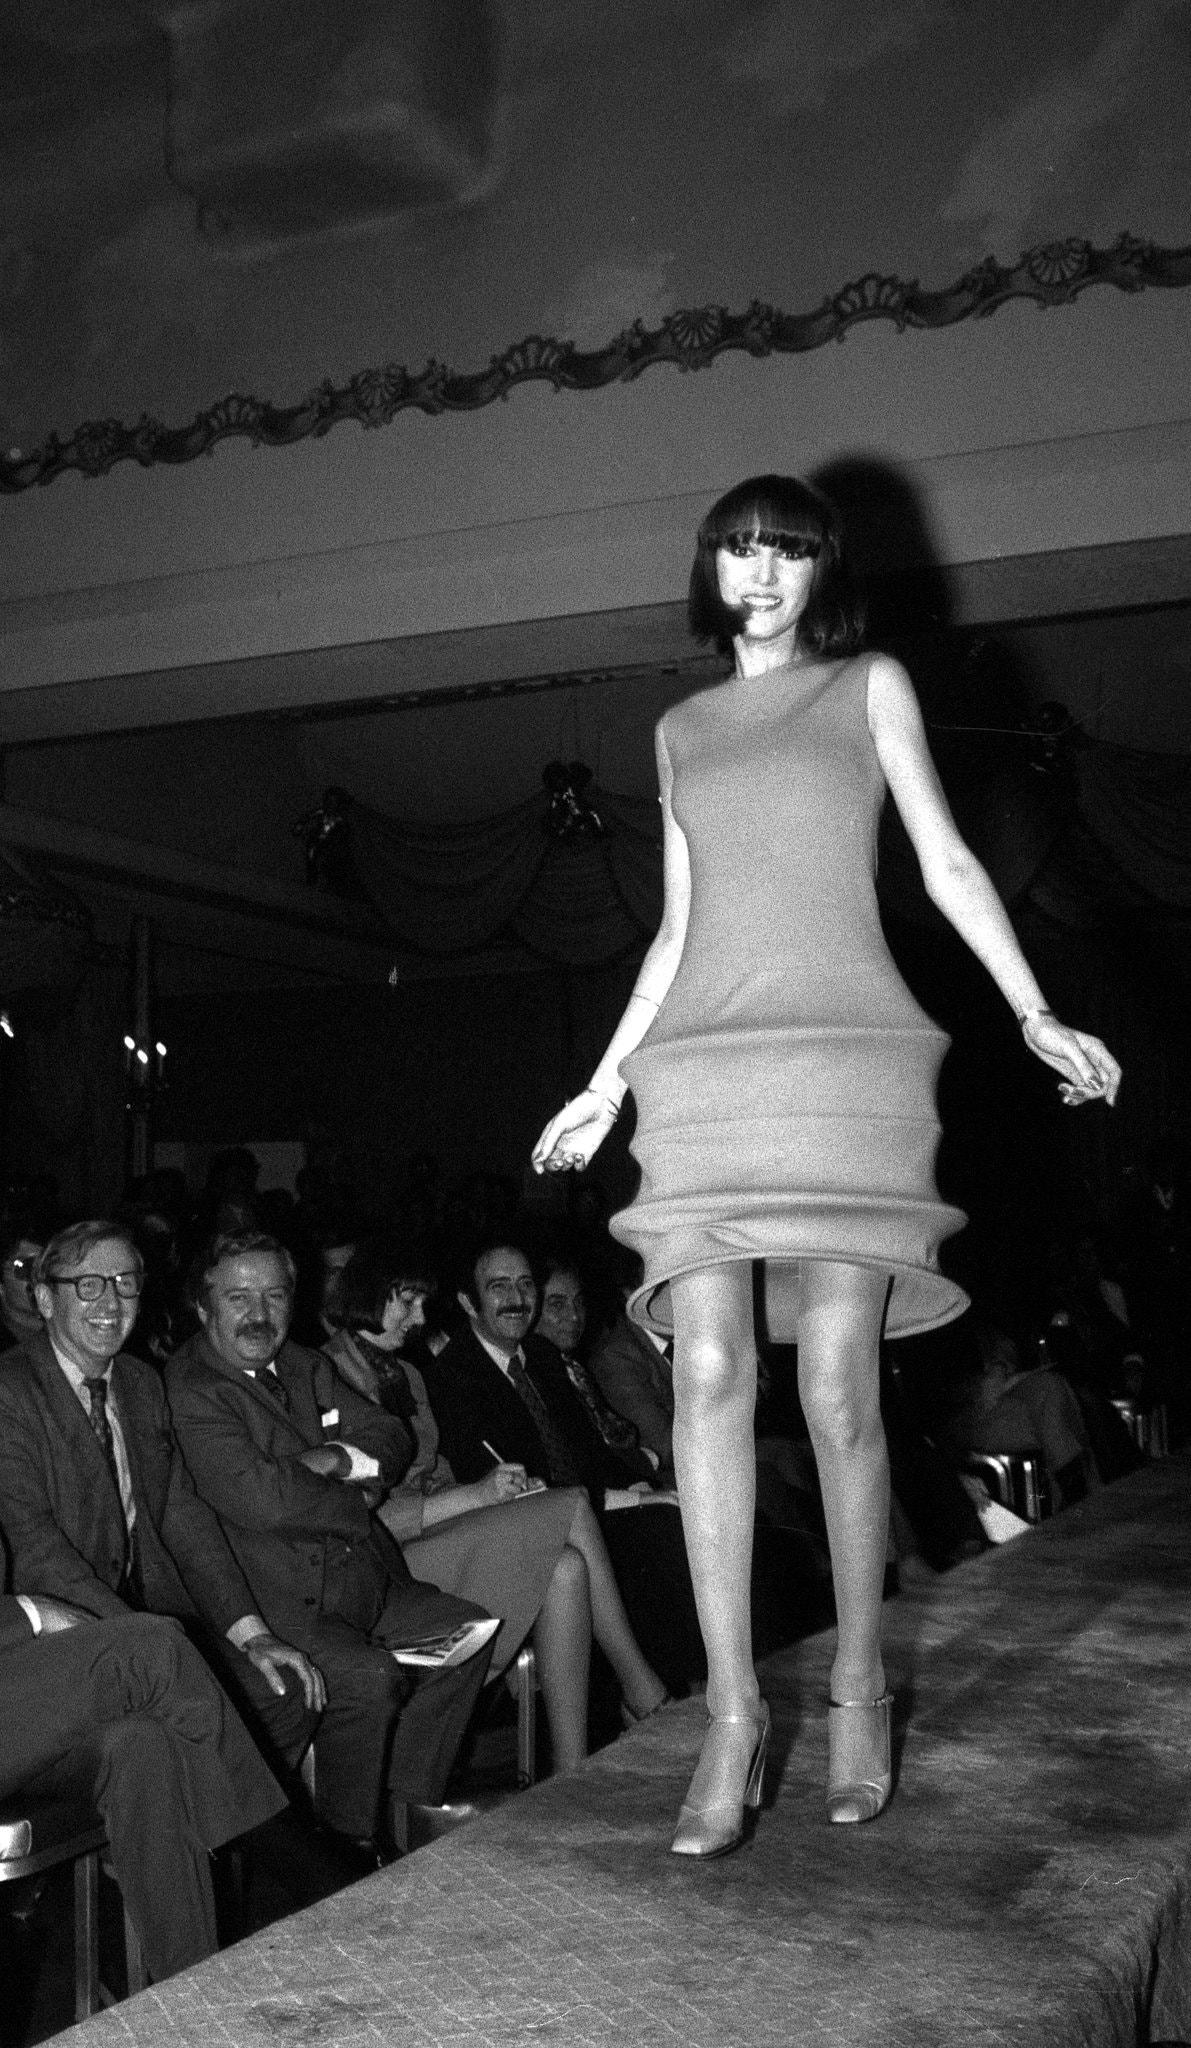 pierre-cardin-dead-iconic-fashion-designs-style-rave